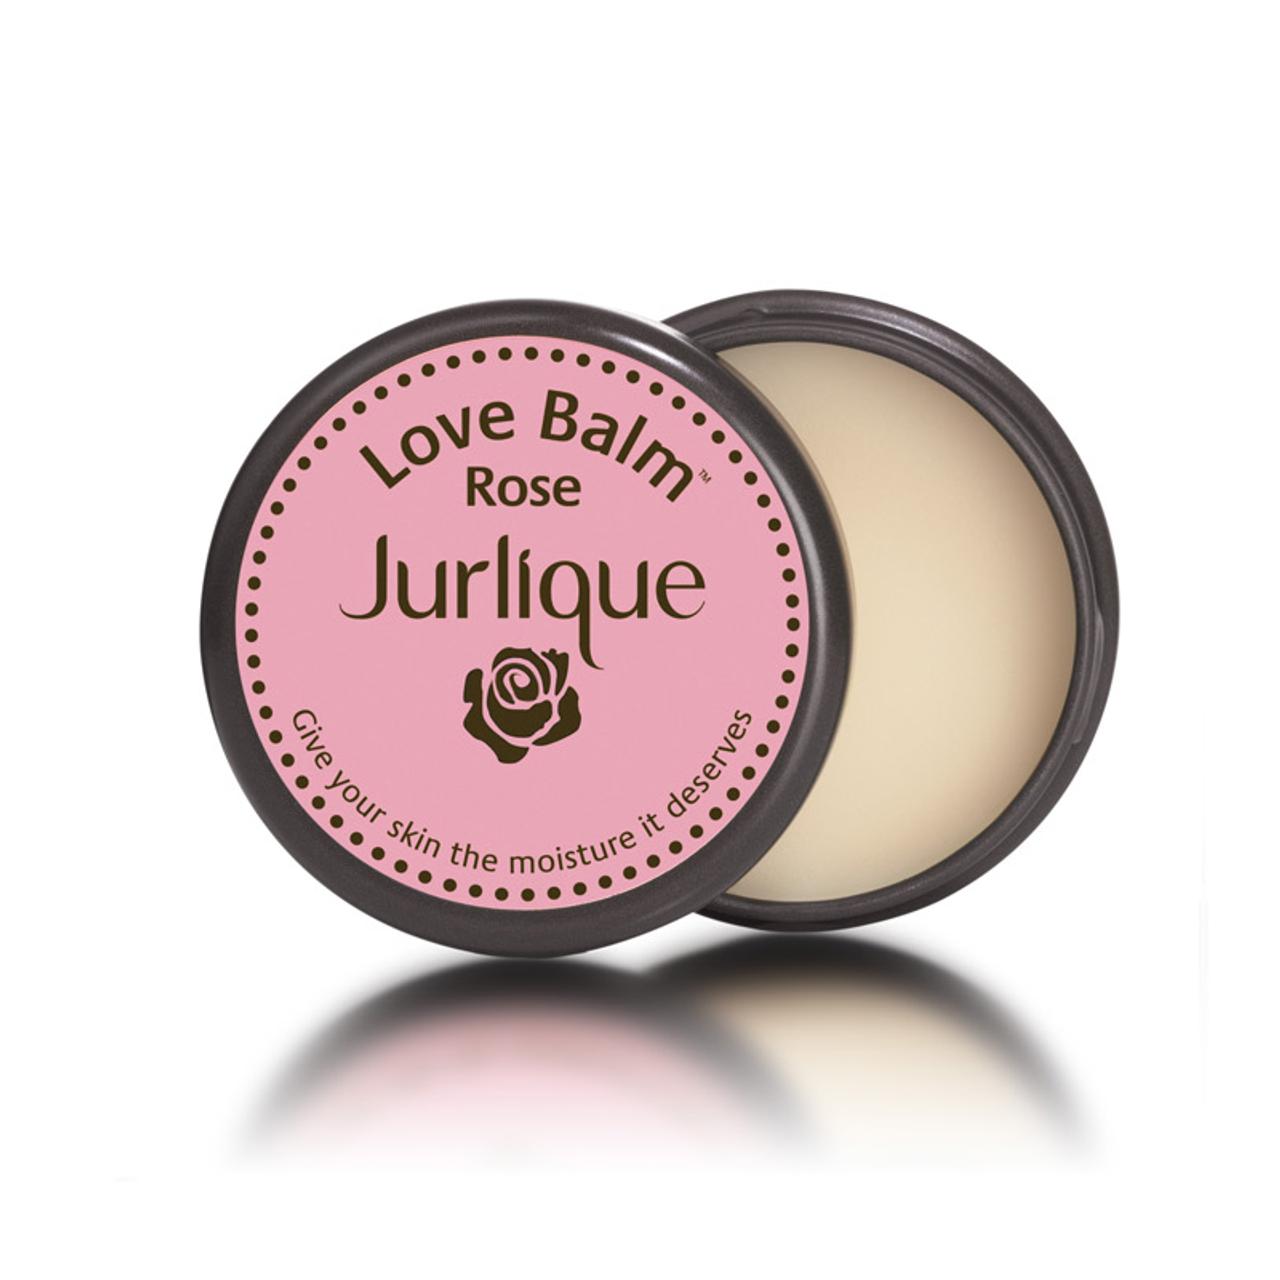 Jurlique Rose Love Balm